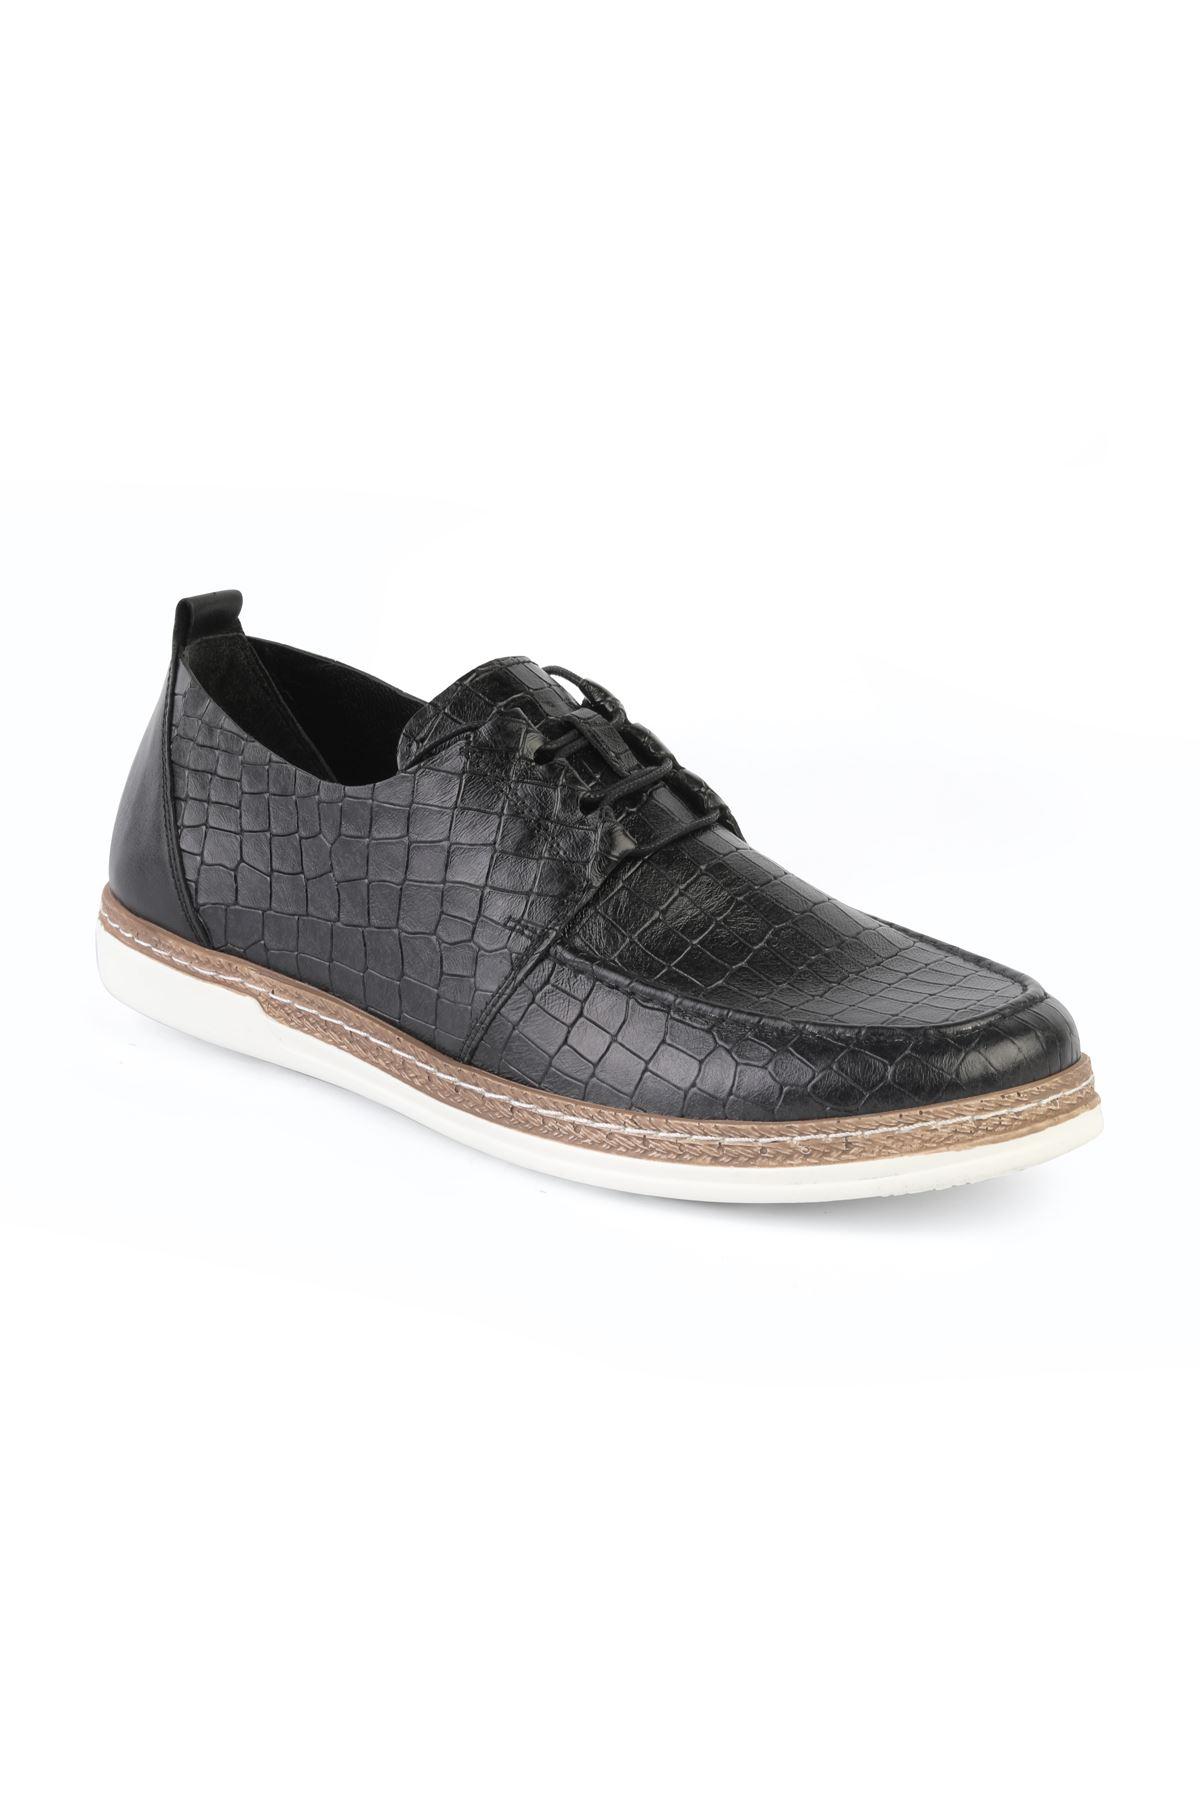 Black T1193 Black Casual Shoes